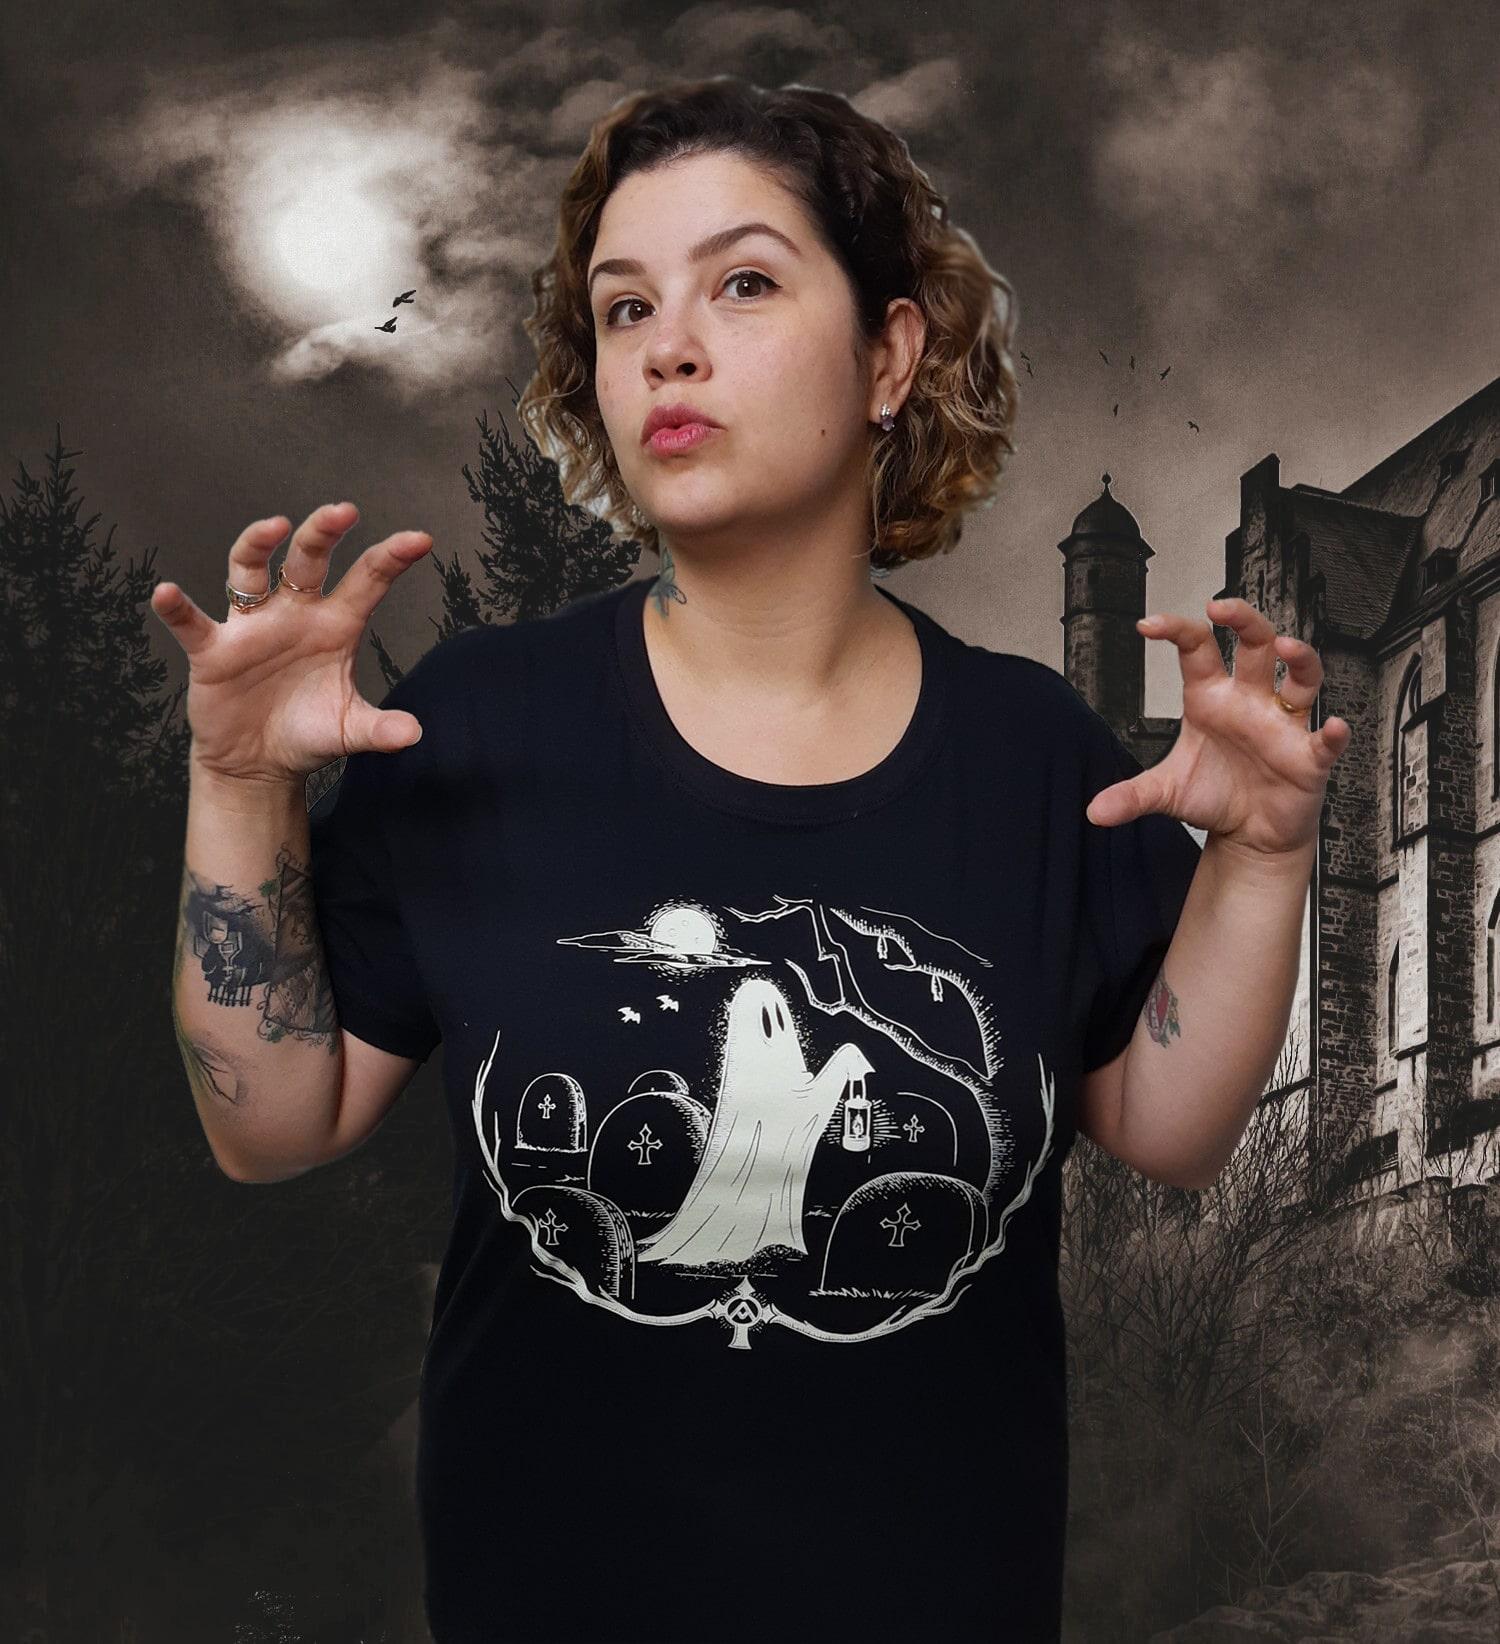 Camiseta Fantasma! (Brilha no Escuro!)